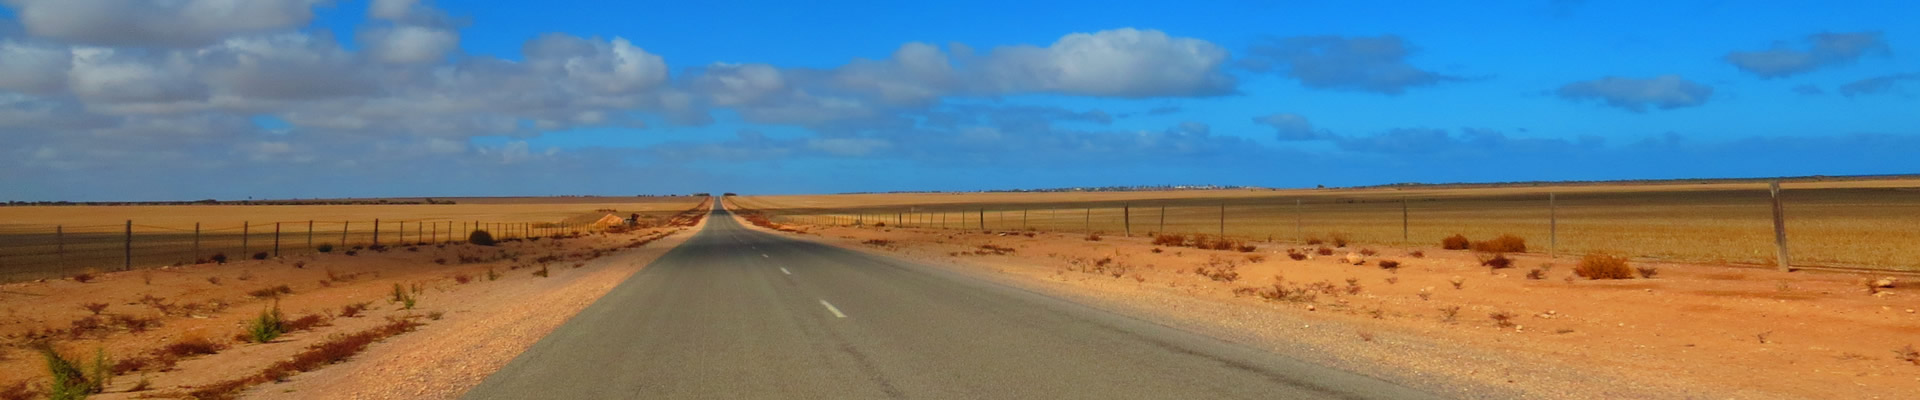 road-slide